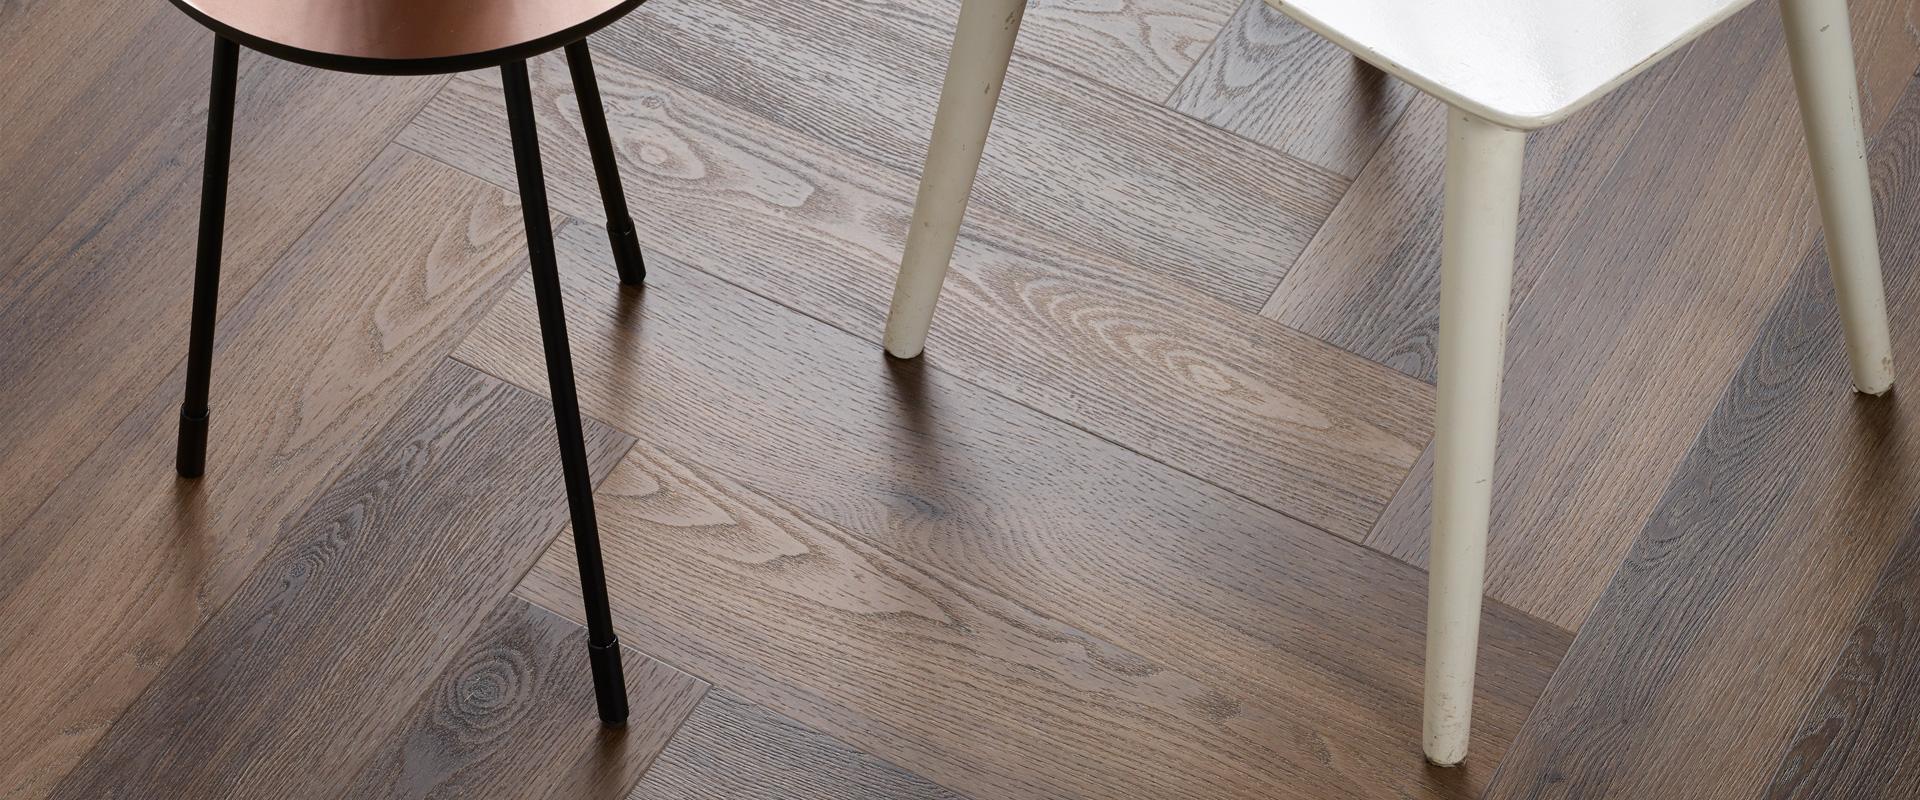 Visgraat PVC vloer | Vloerenland